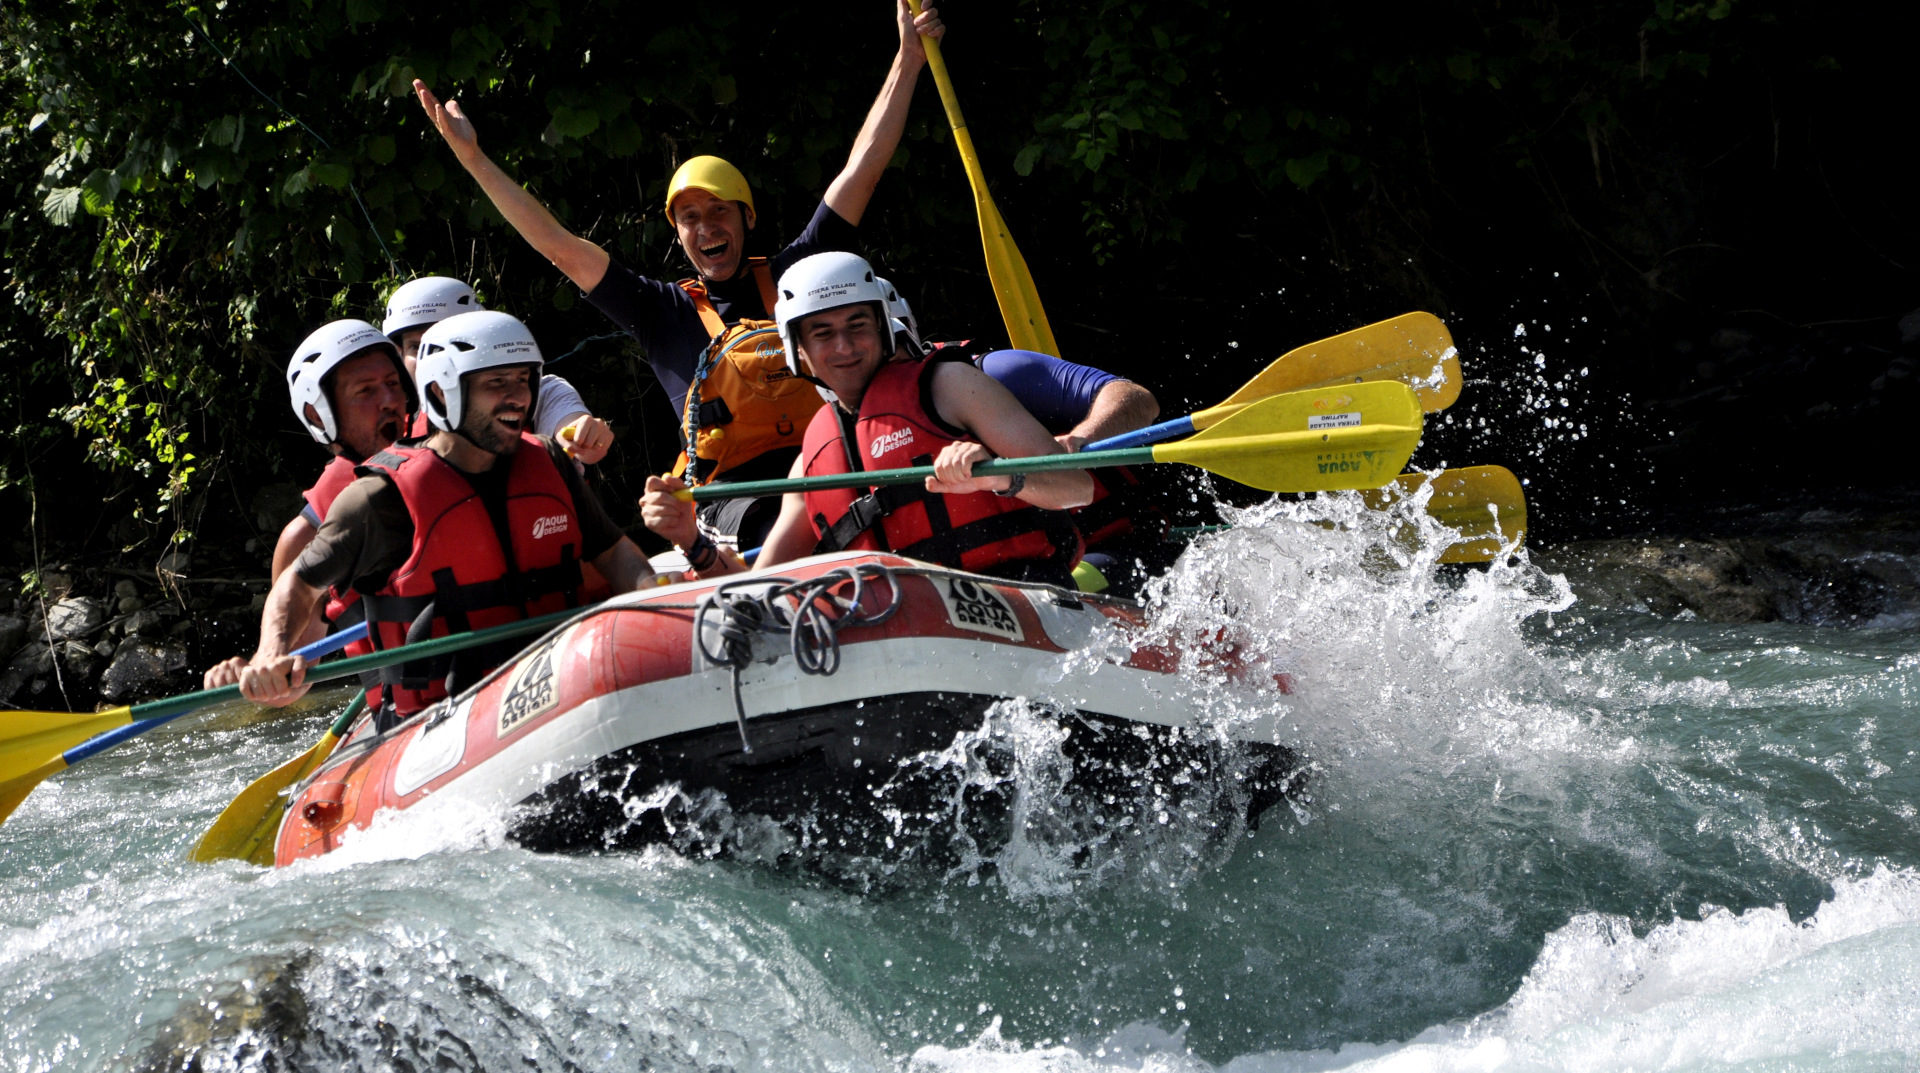 Rafting Valle Stura di Demonte